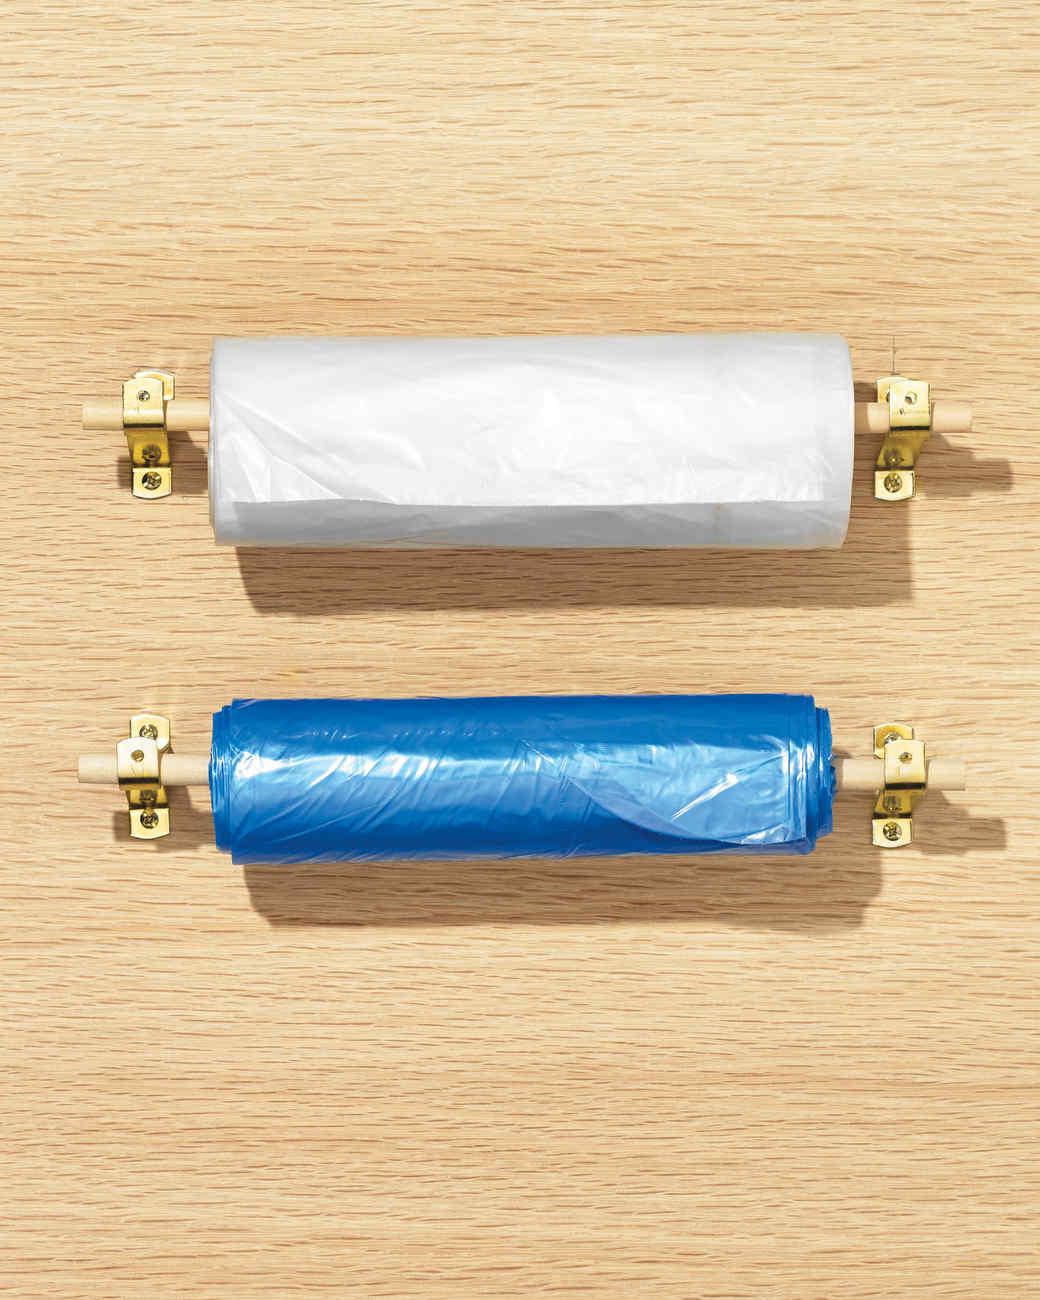 paper-towel-holders-for-trash-bags-223-d111605.jpg